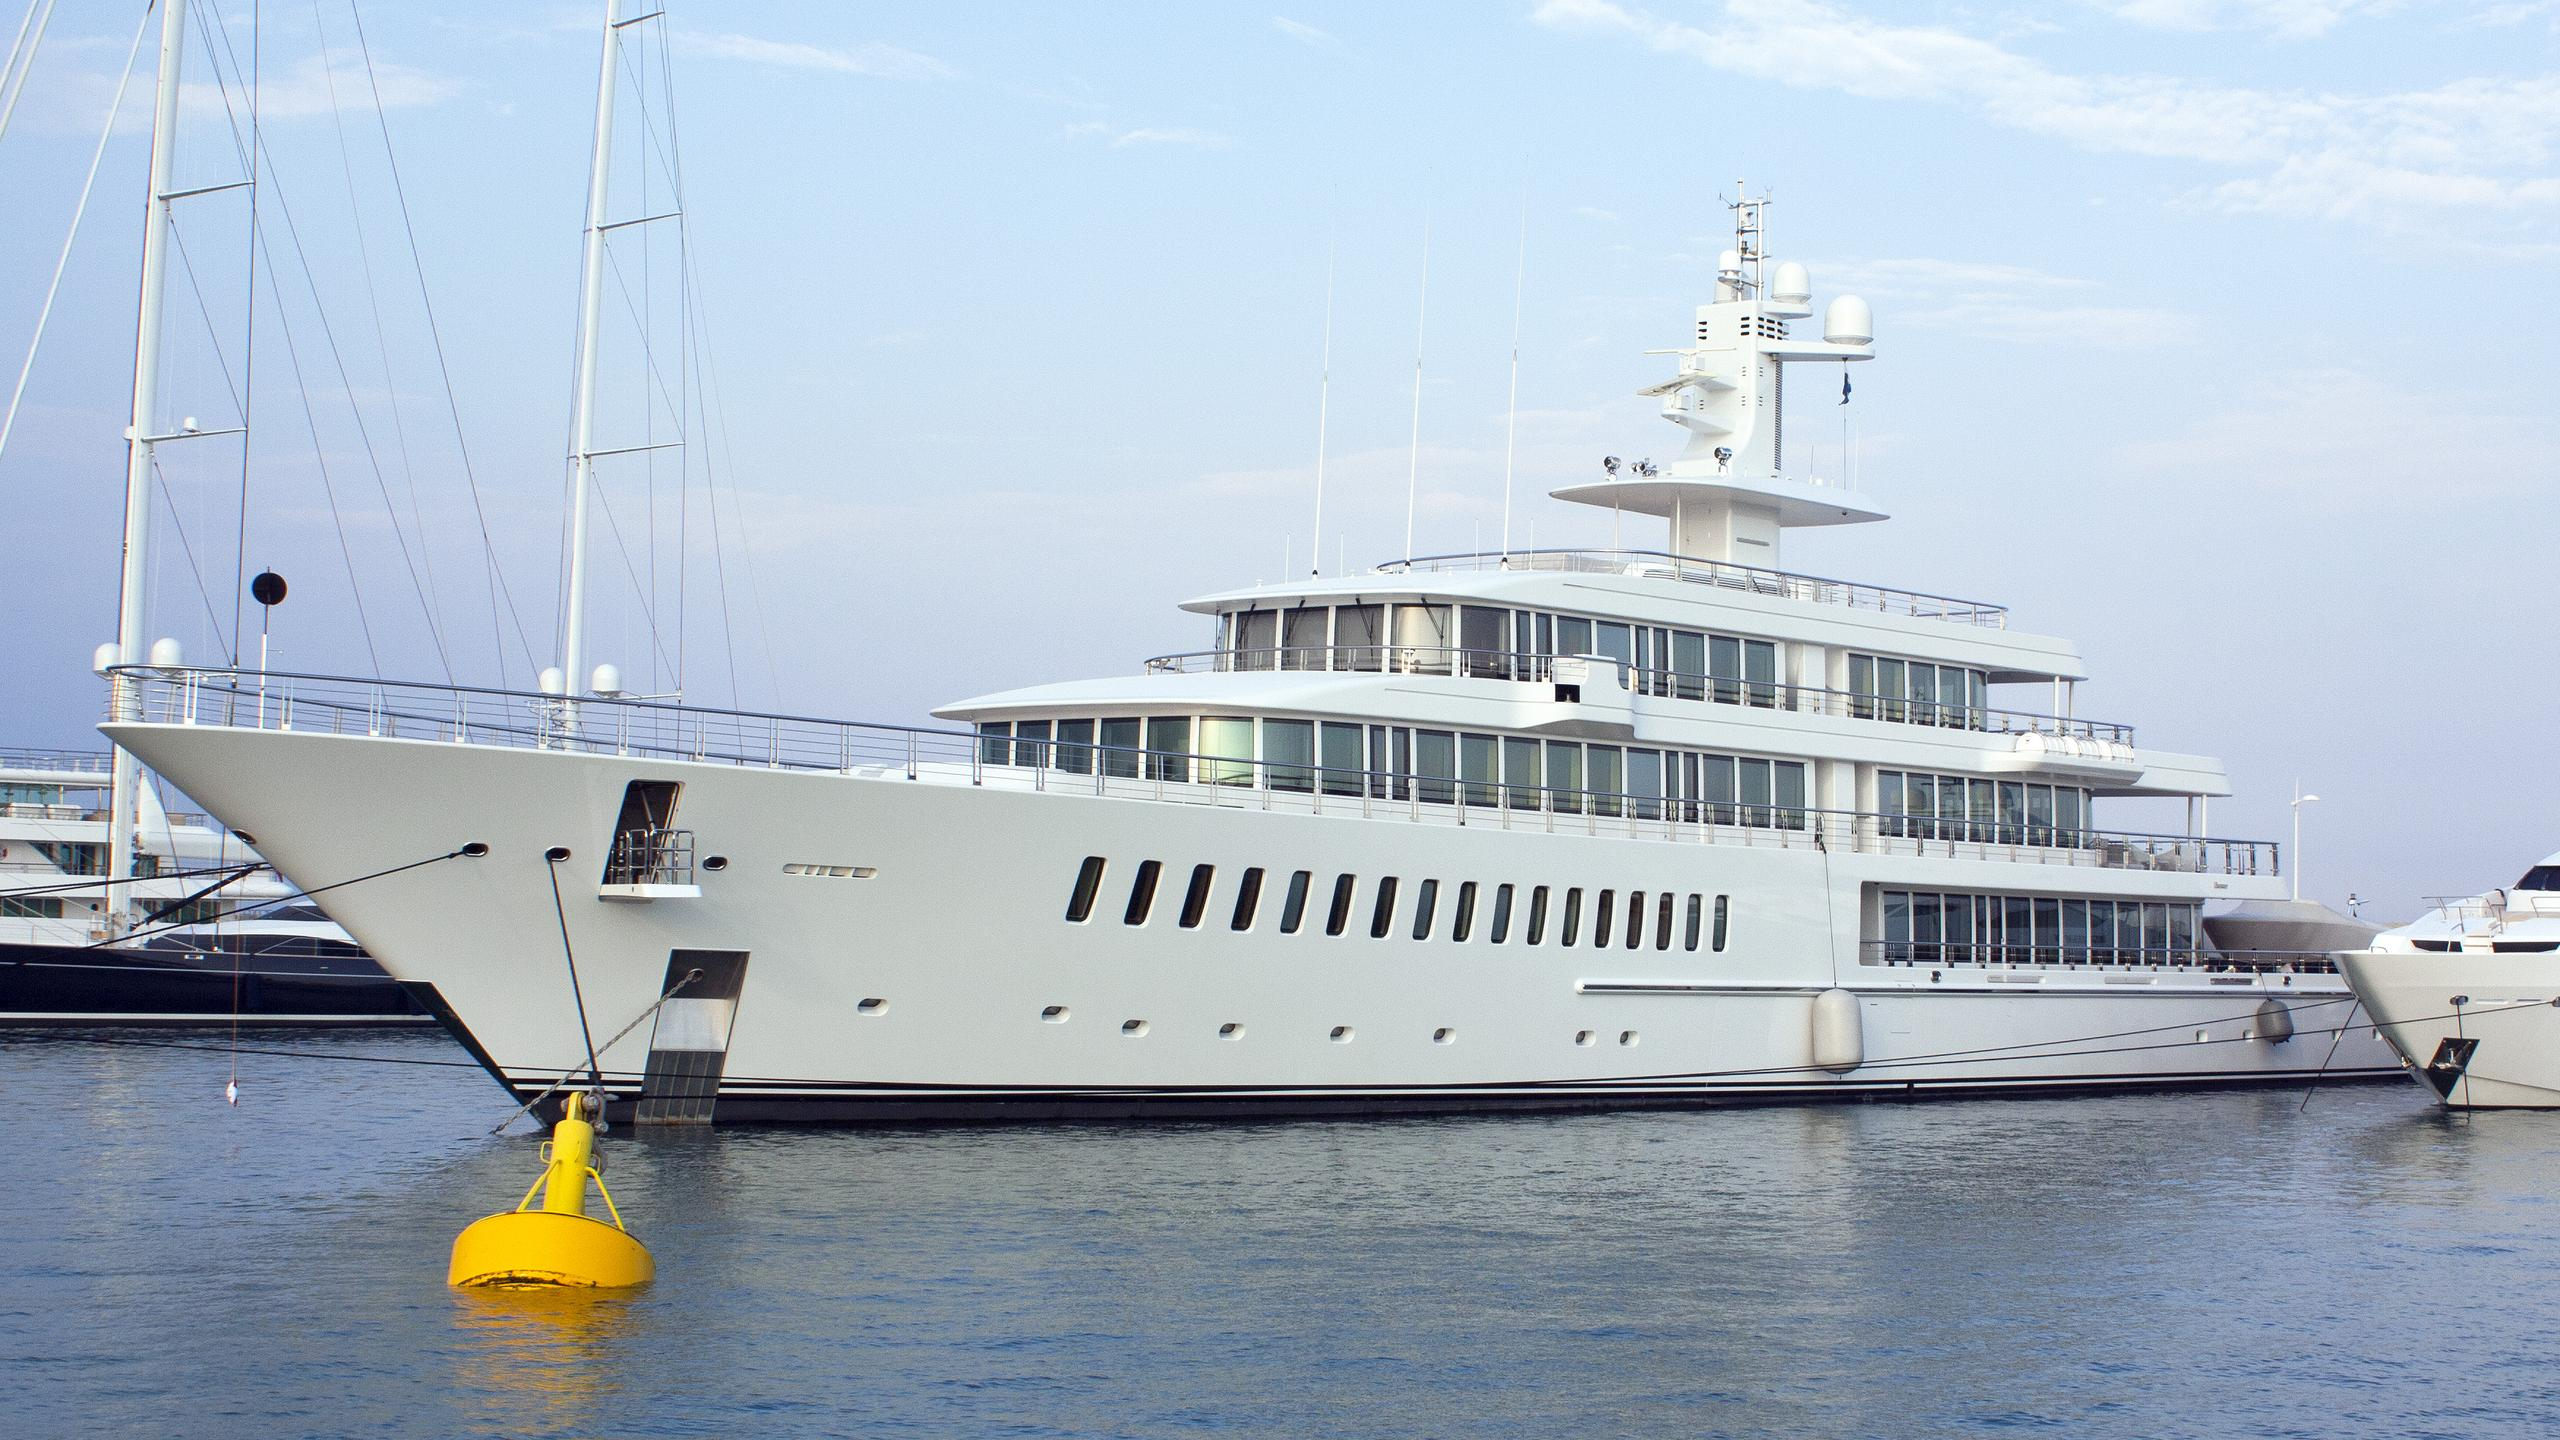 musashi-motor-yacht-feadhsip-2011-88m-half-profiile